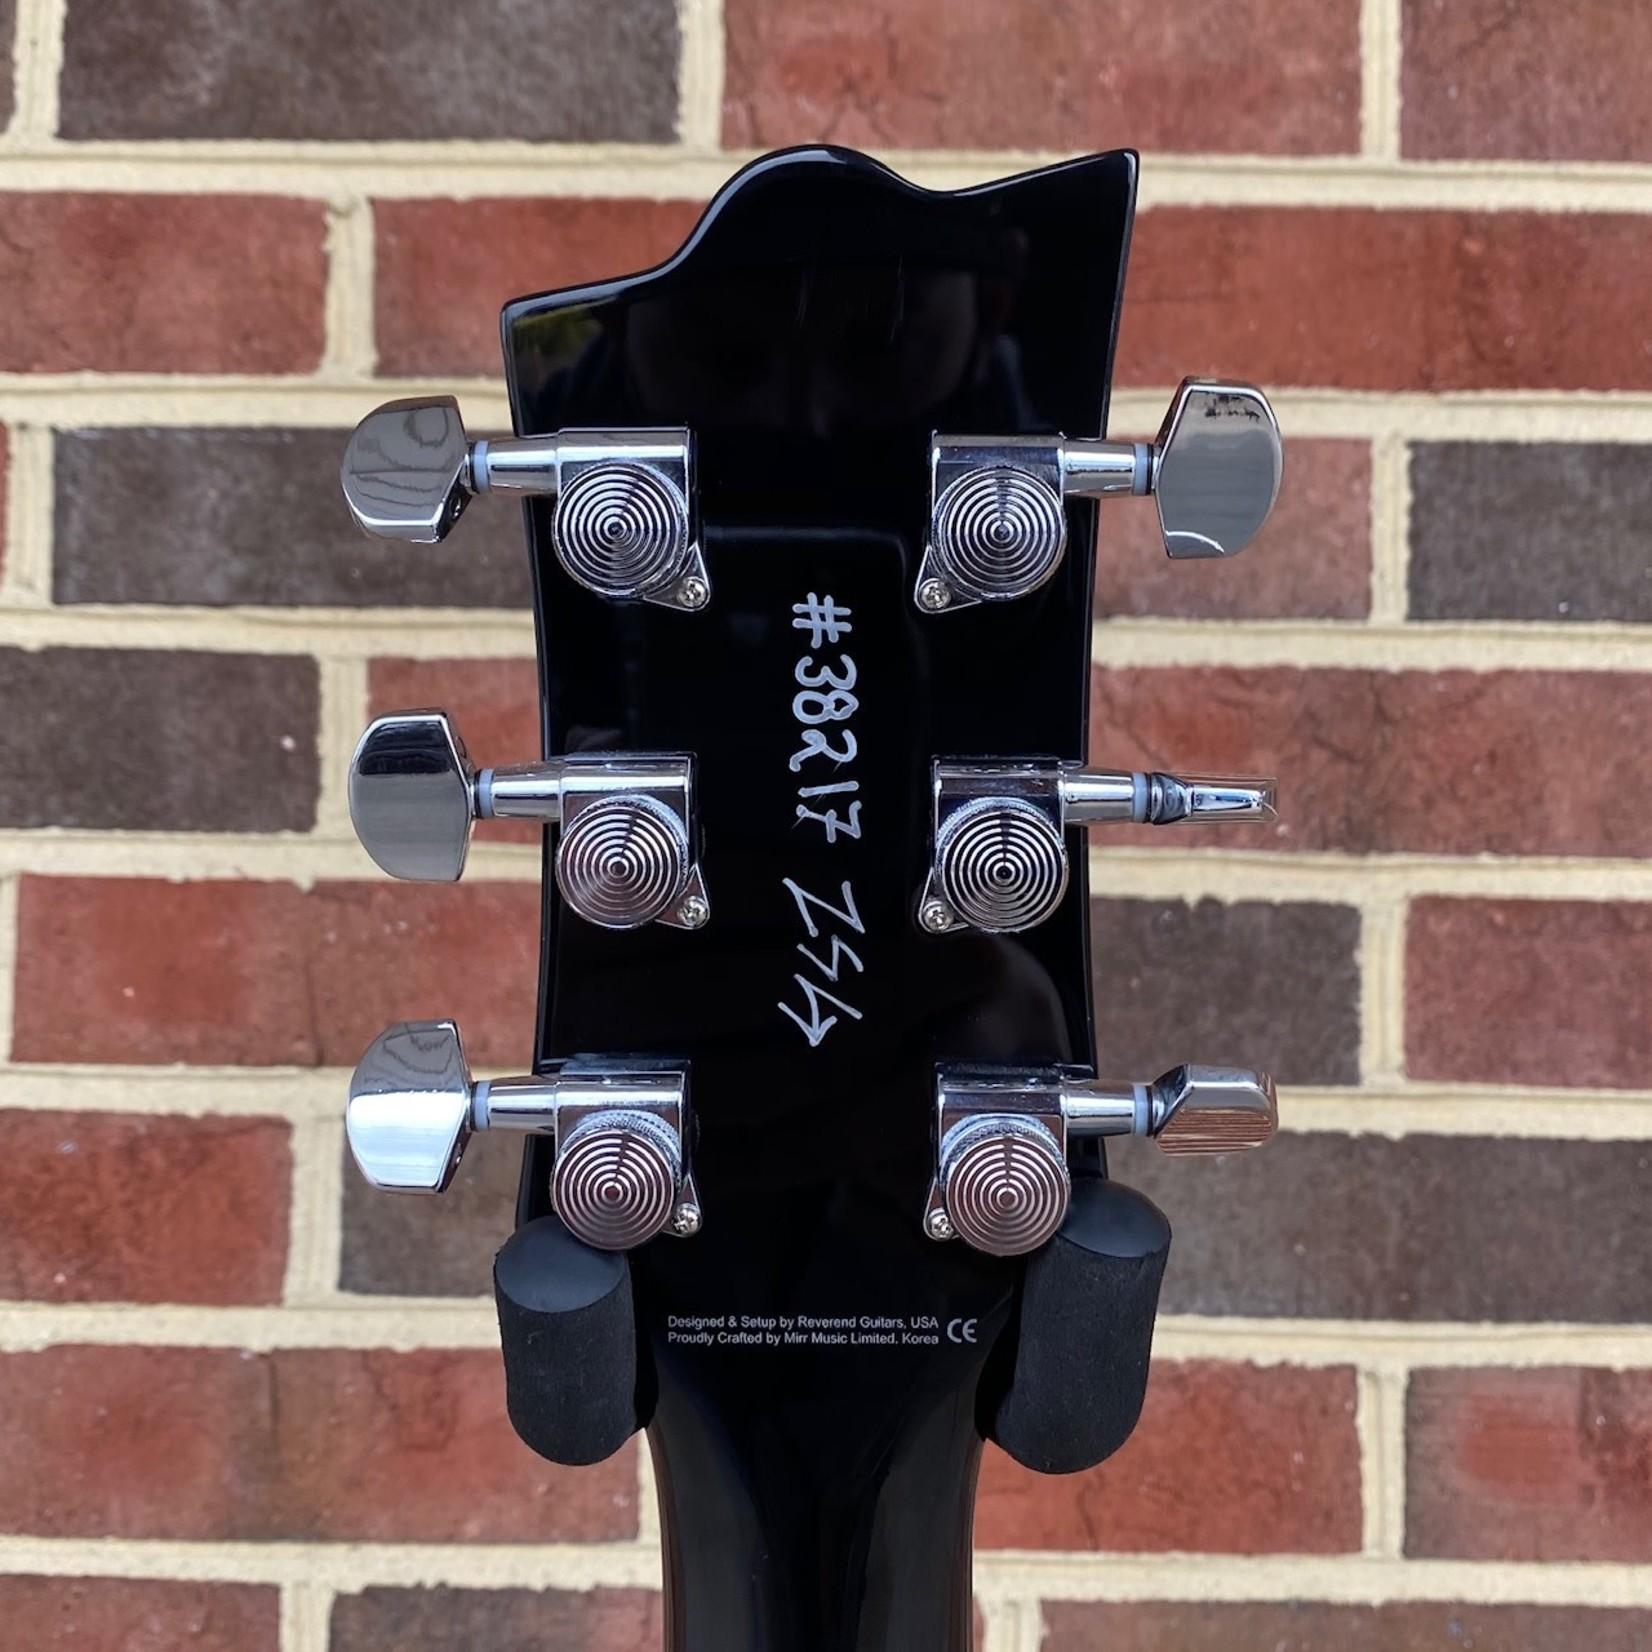 Reverend Reverend Guitars Sensei HB, Sky Burst, Flamed Maple Top, Korina Body and Neck, Pau Ferro Fretboard, Locking Tuners